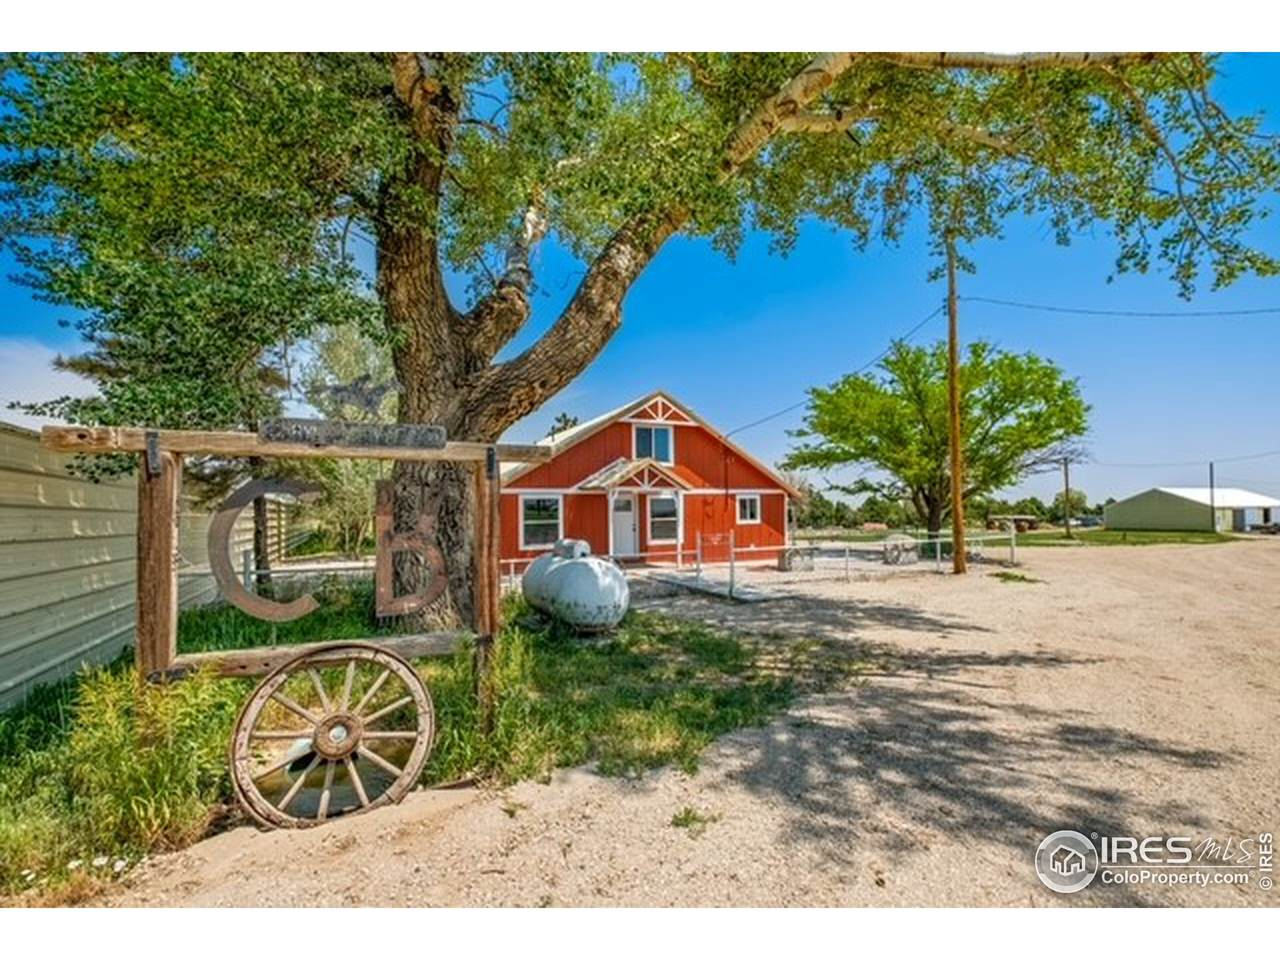 8738 County Road 59 - Photo 1